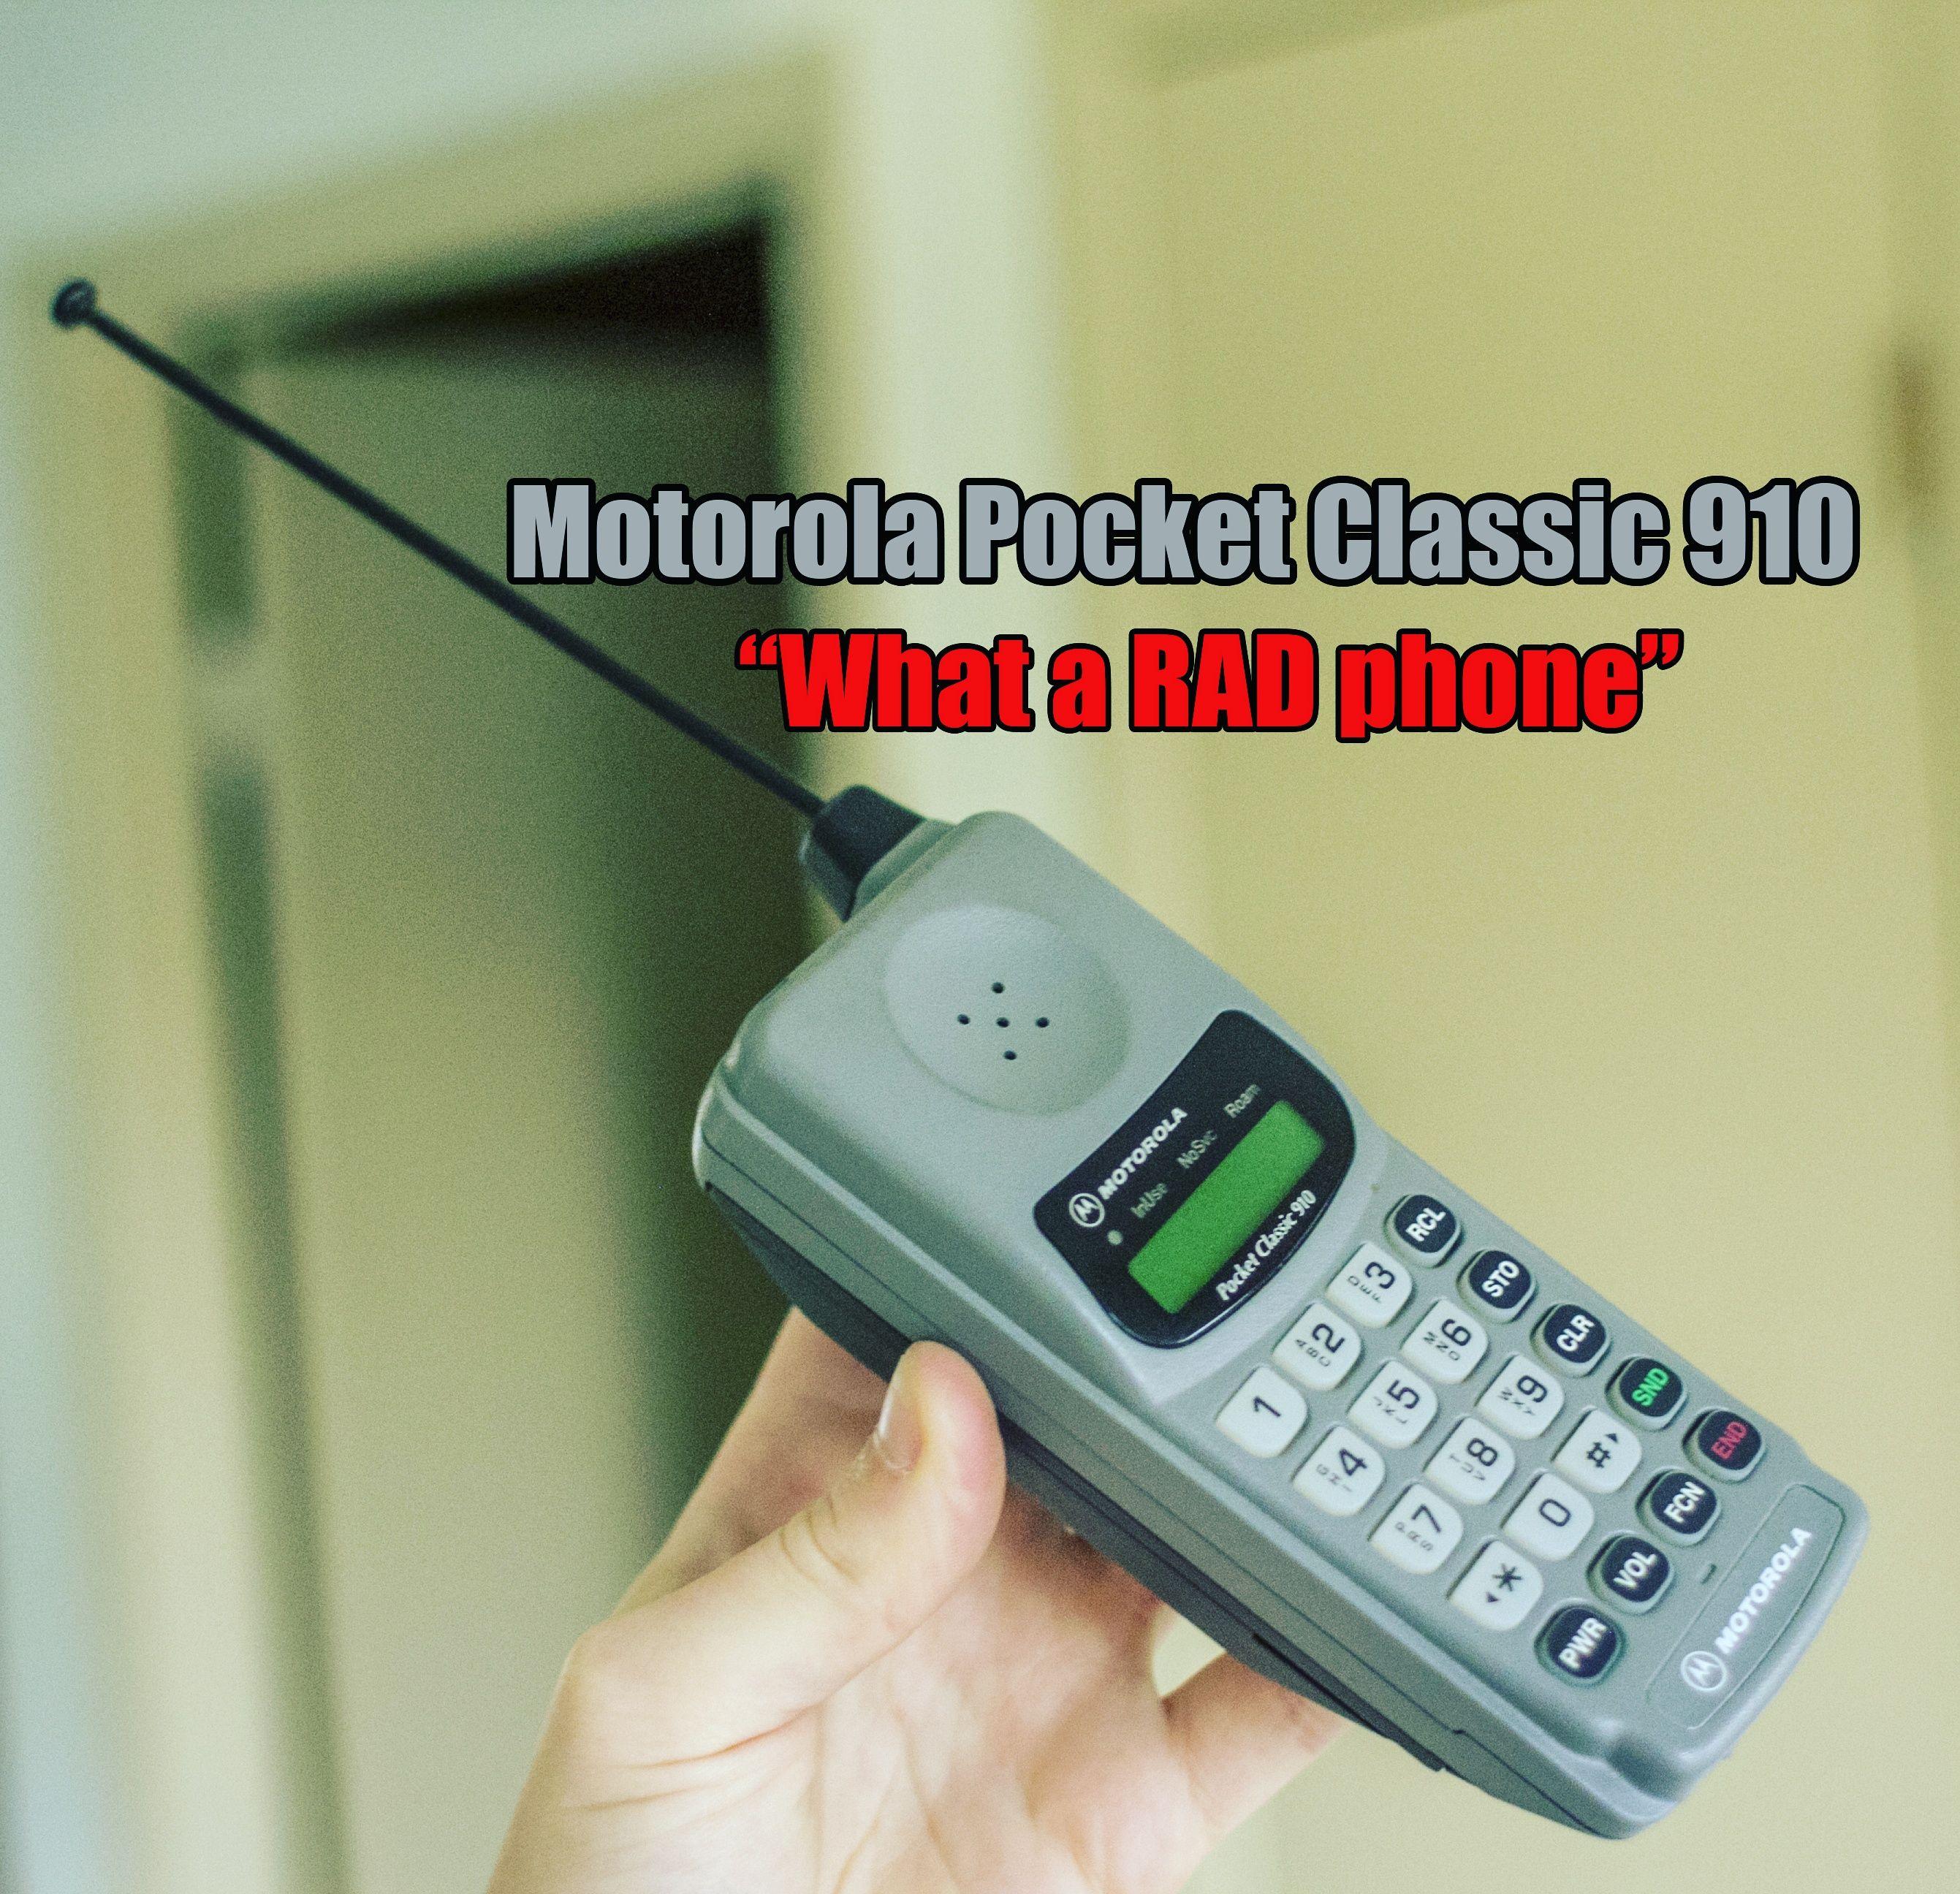 Motorola Pocket Classic 910 Classic Phones Cell Phone Brick Phone